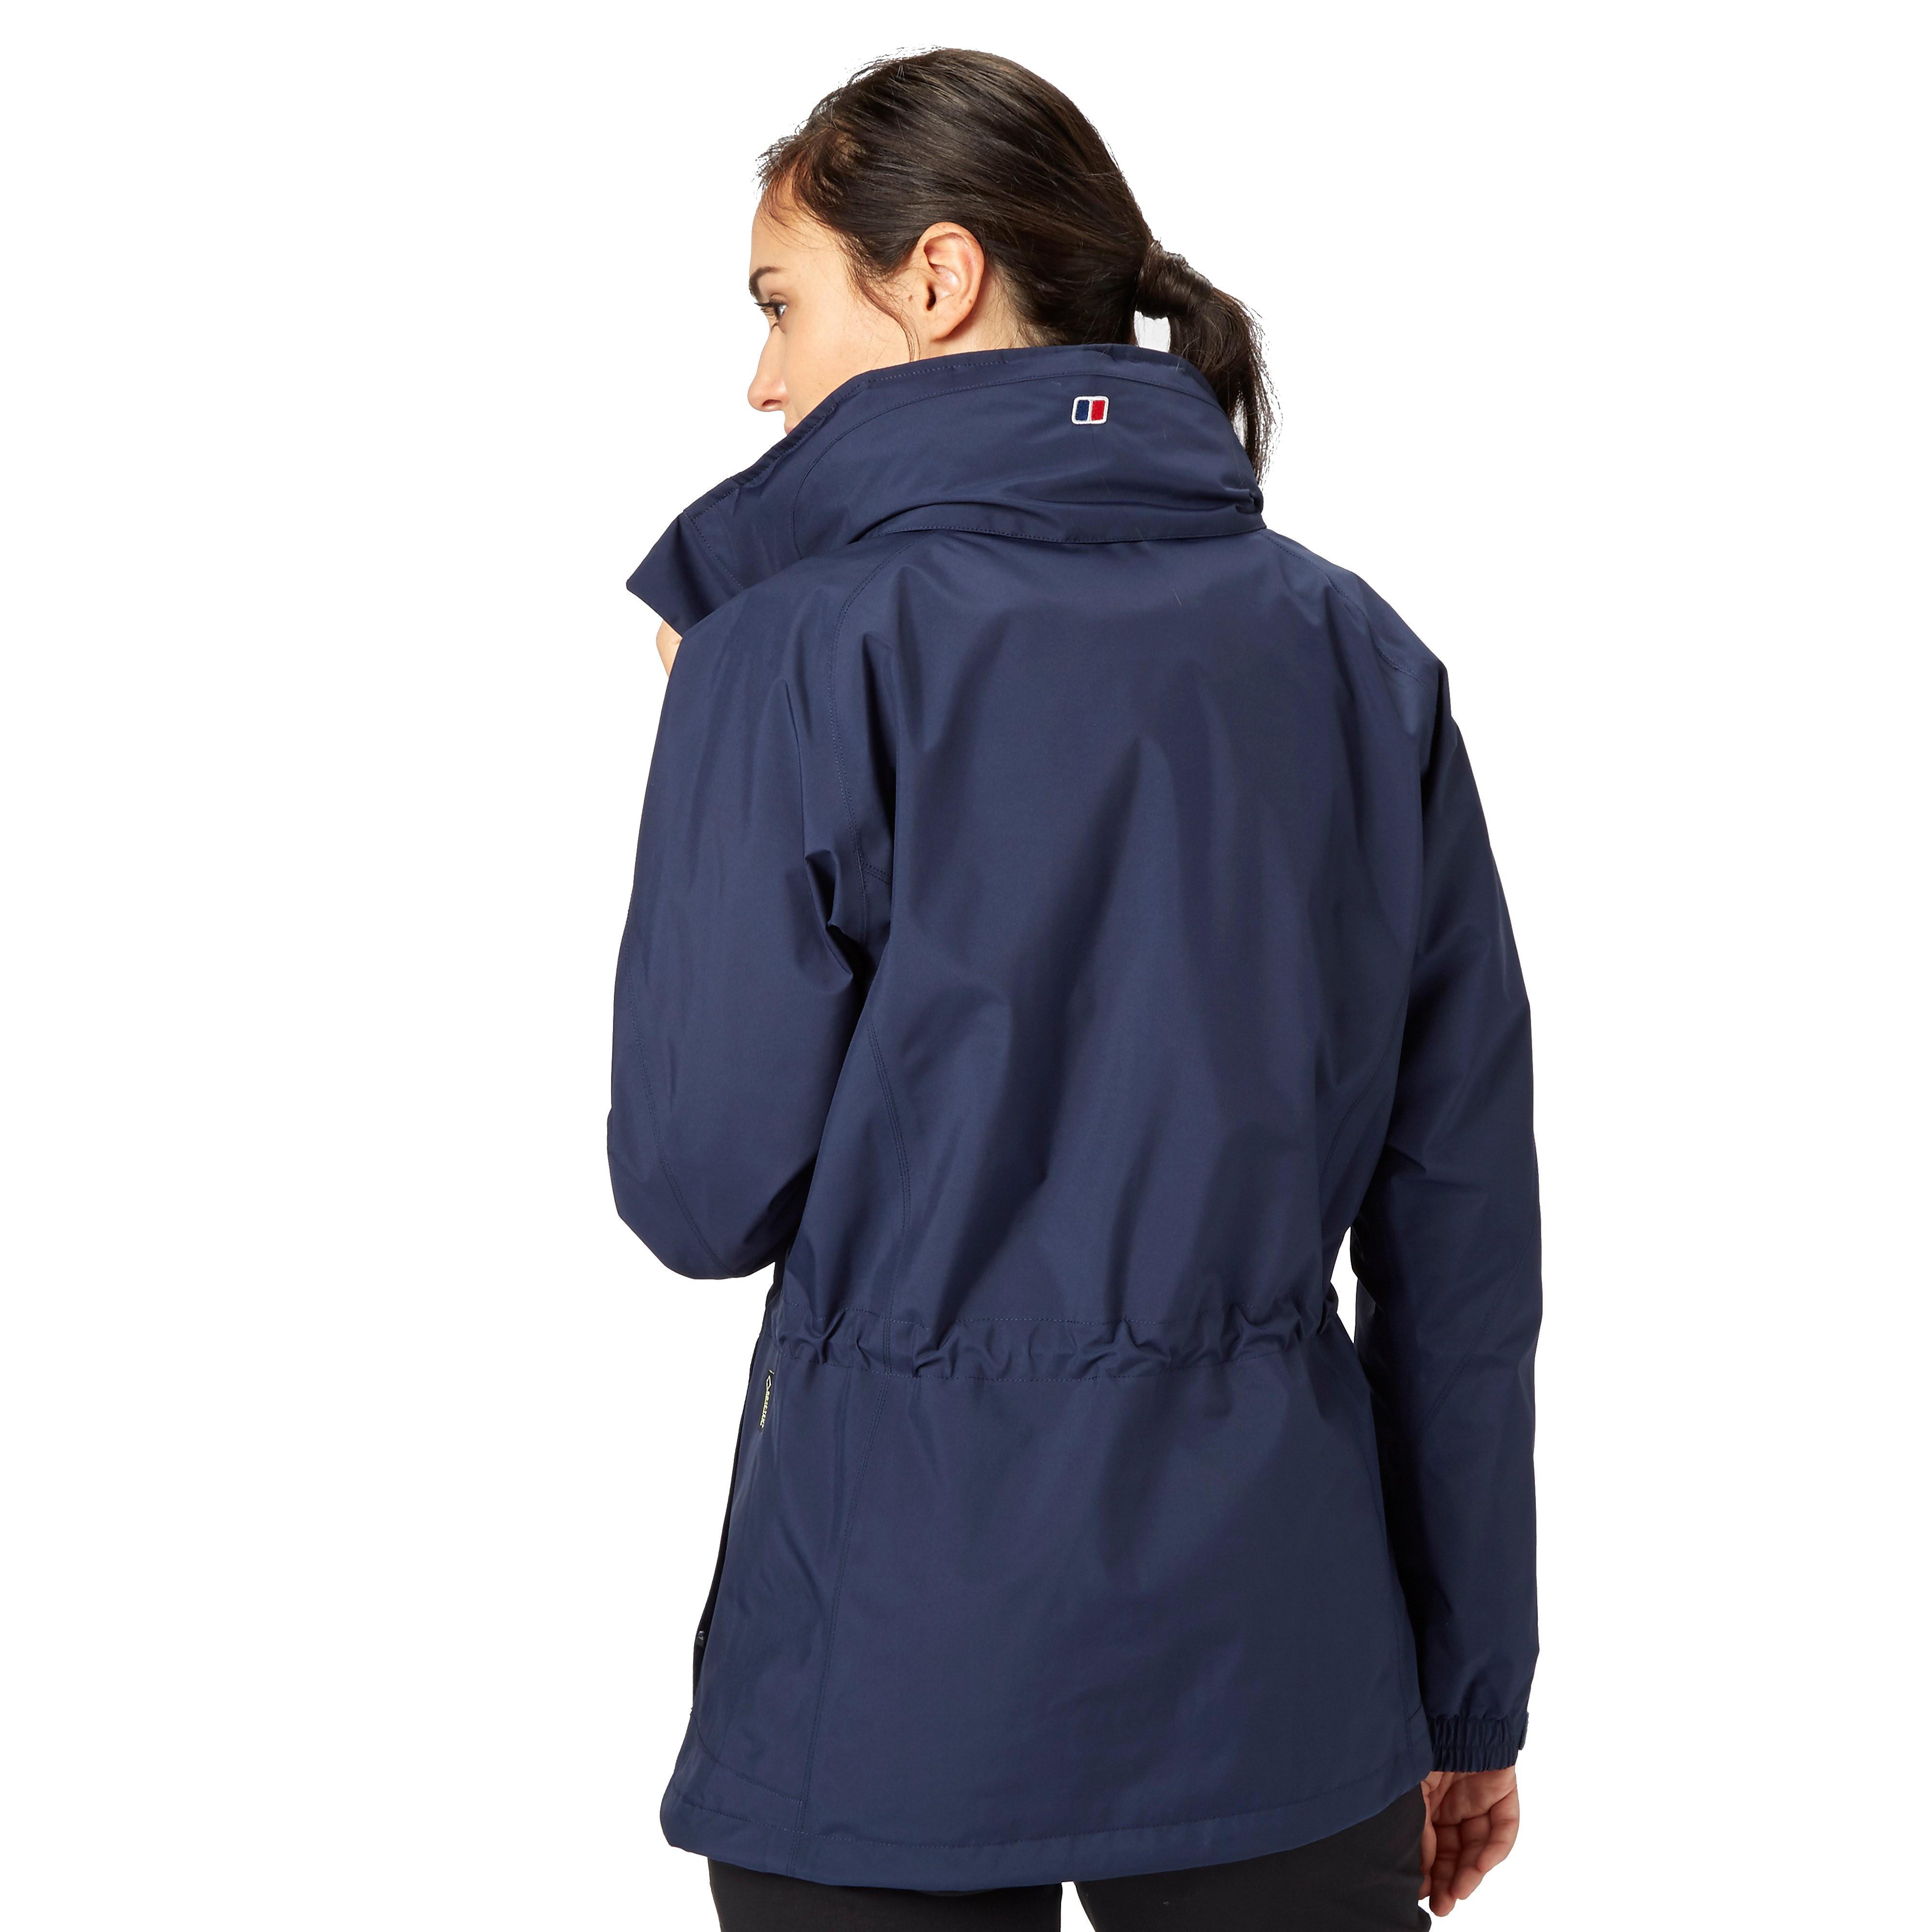 Berghaus Glissade III InterActive Gore-Tex Women's Jacket